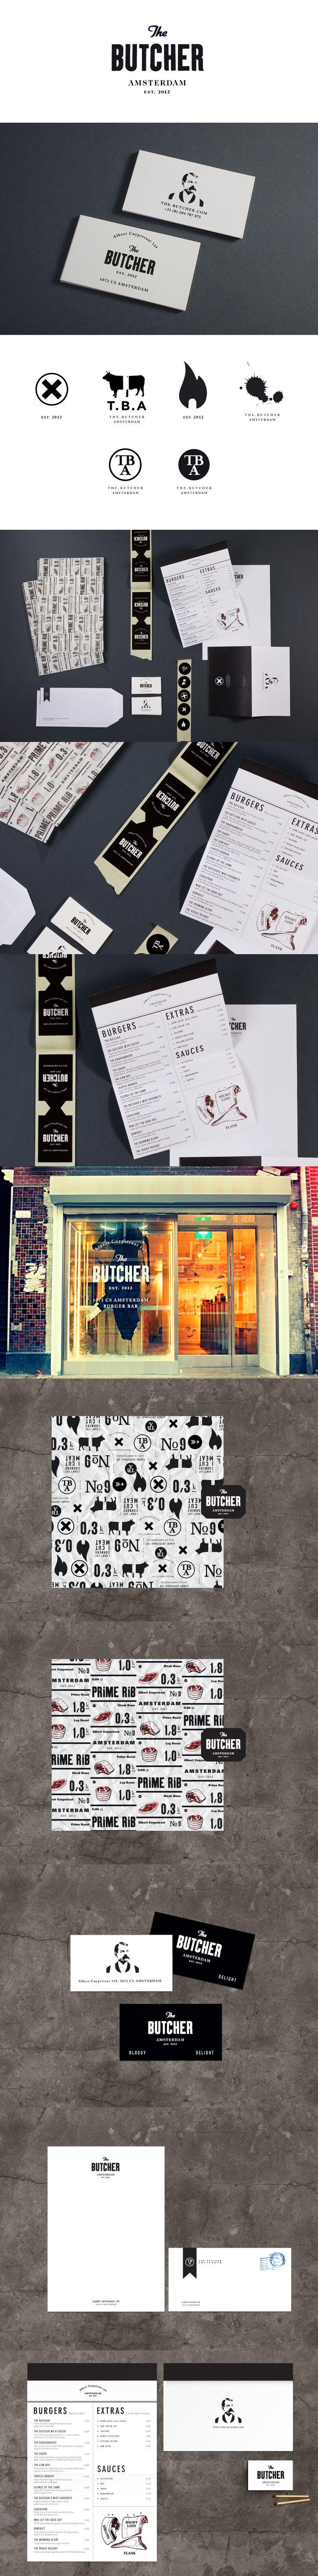 Identity / koniakdesign / the butcher